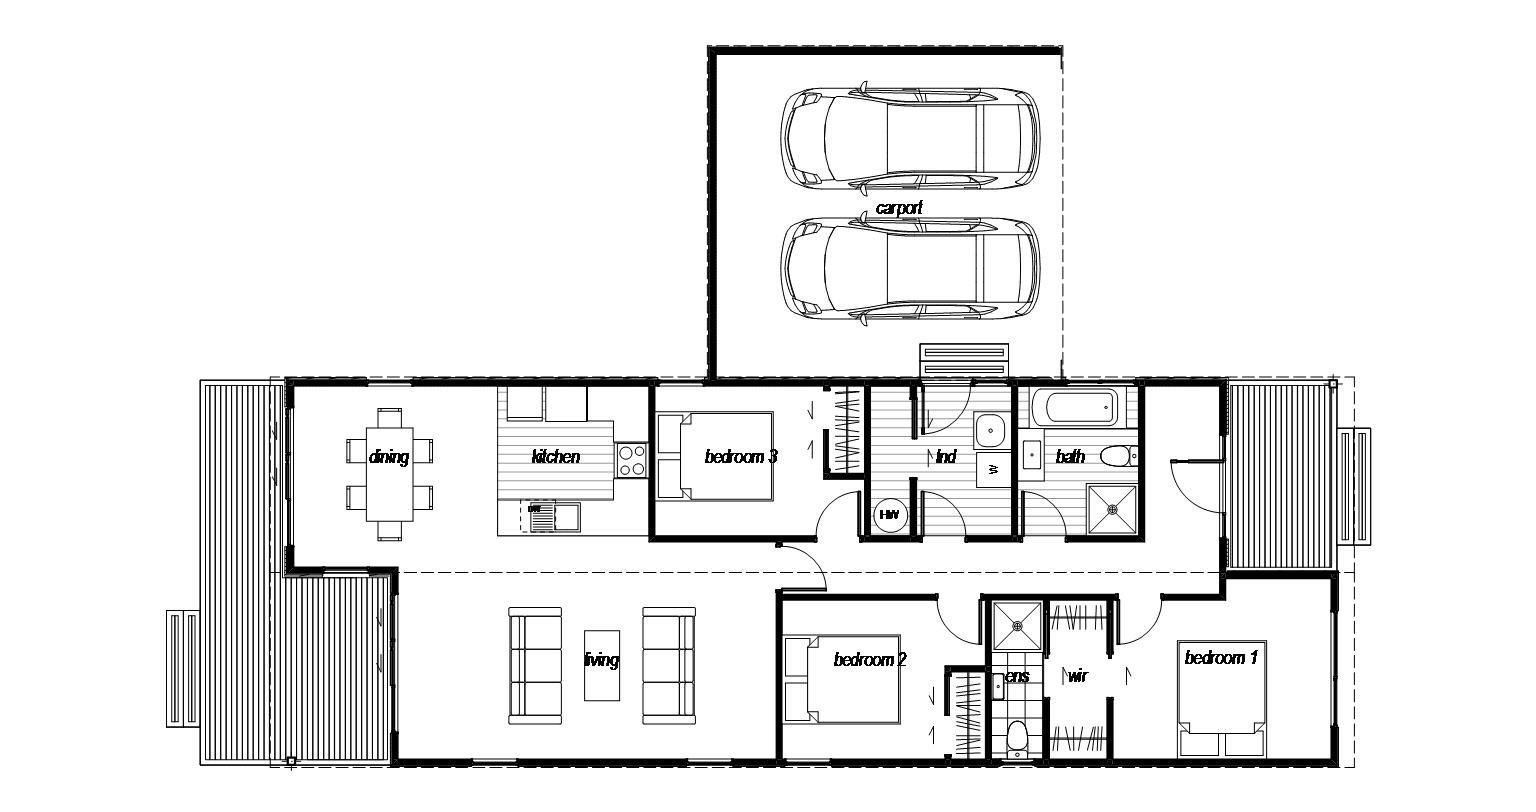 Wakatipu is a 3 Bedroom prefab home by Genius Homes